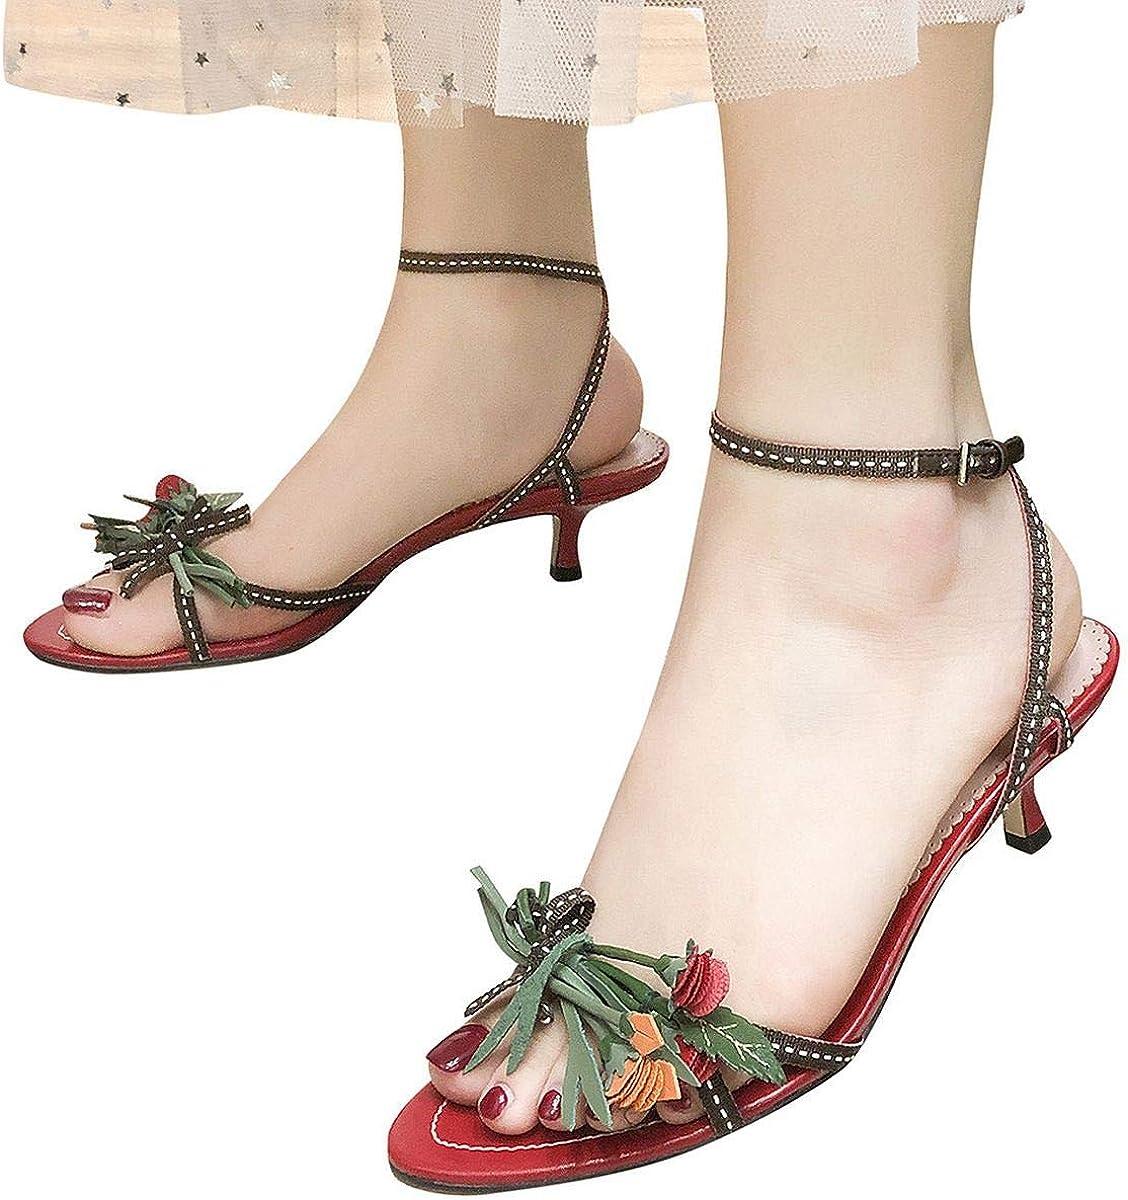 Womens Fringe Open Toe High Heel Sandals Tassels Slingback Shoes Heeled Sandals